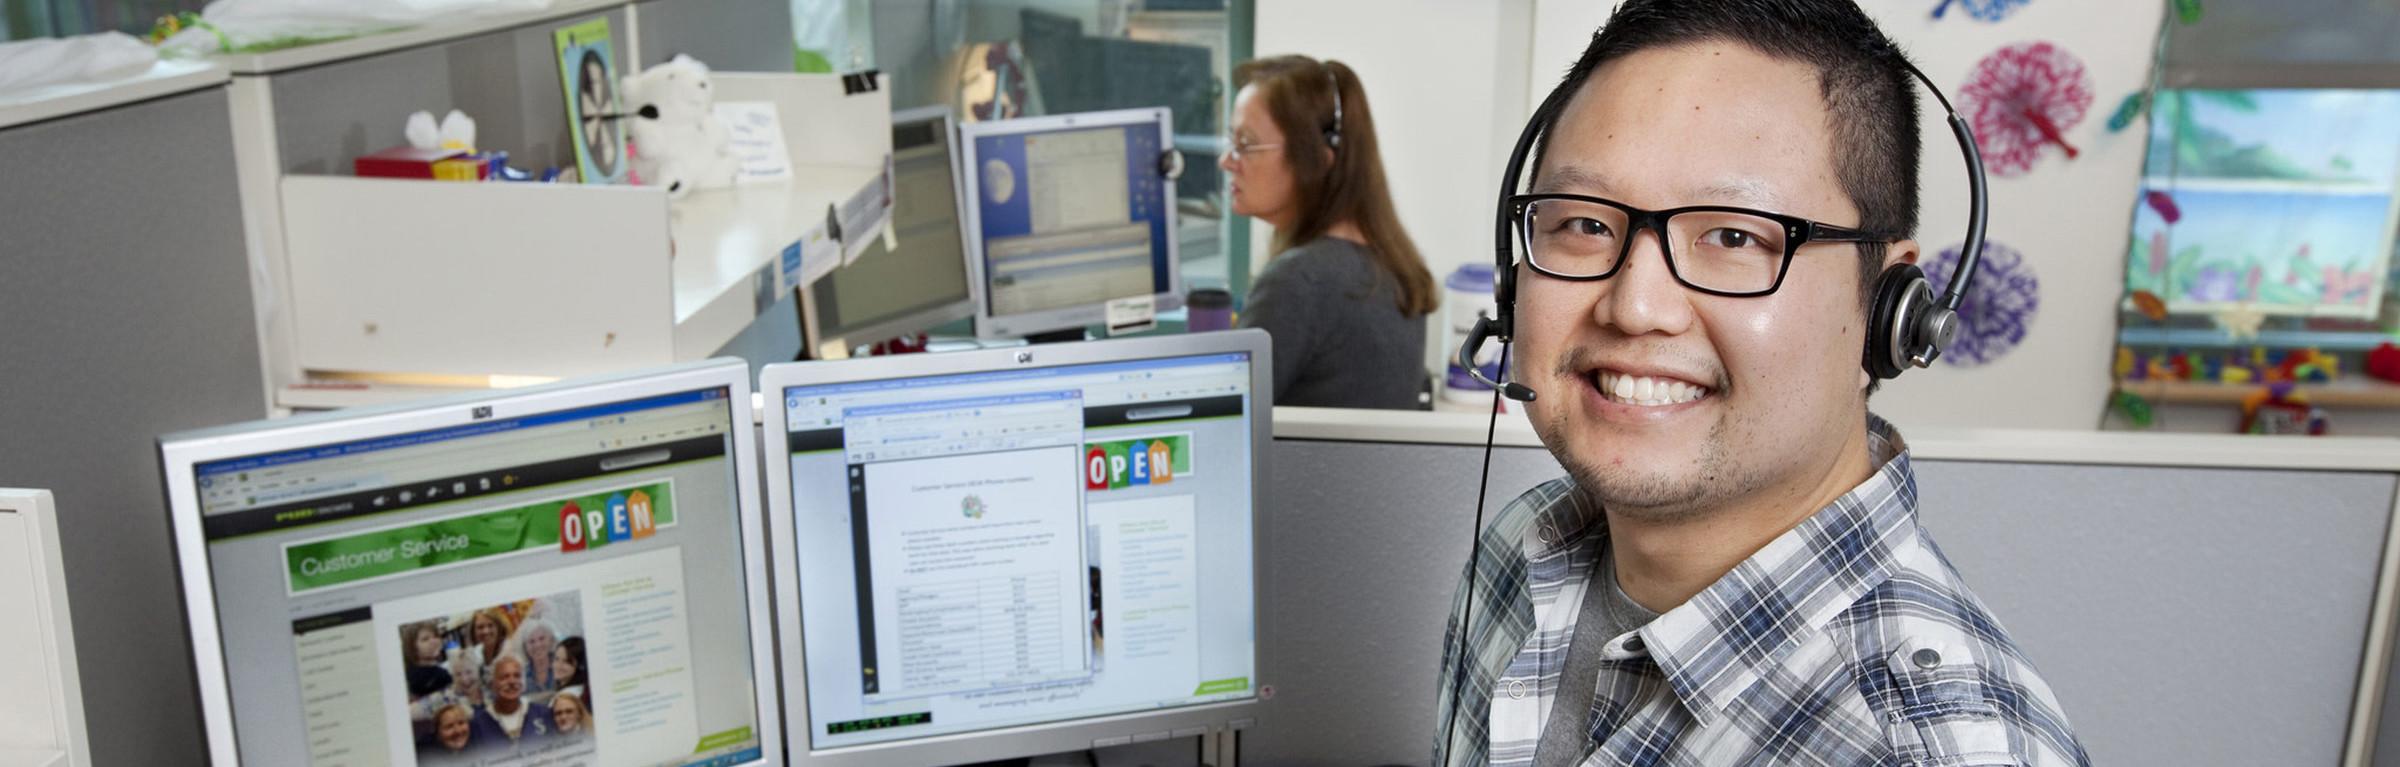 technology jobs careers career opportunities increase brain math skills coding sp snopud